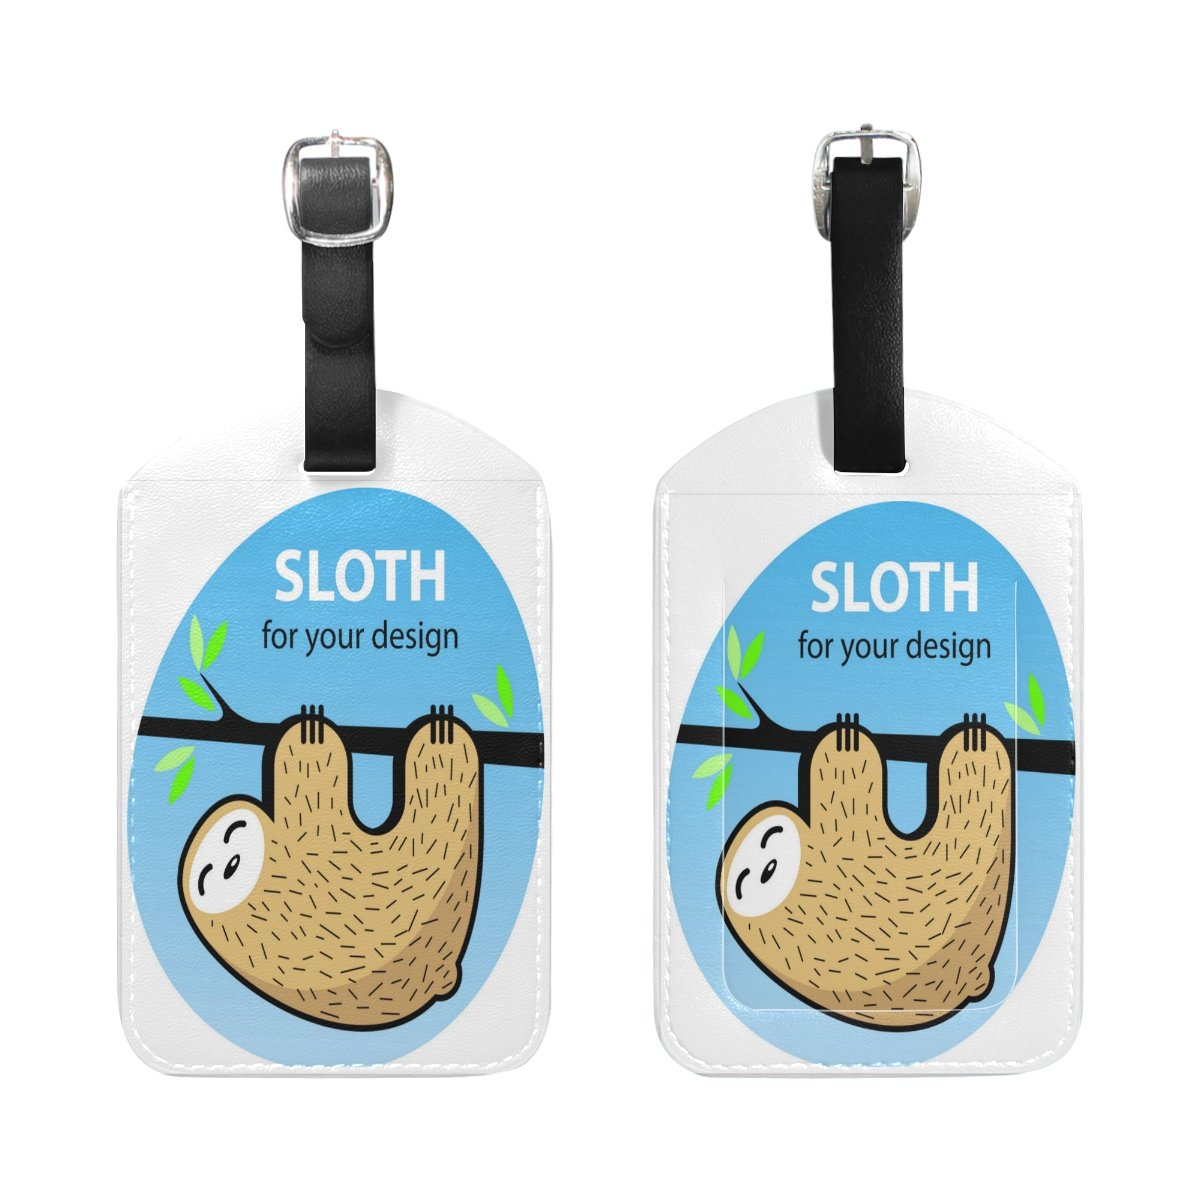 1Pcs Saobao Travel Luggage Tag Cute Cartoon Sloth PU Leather Baggage Suitcase Travel ID Bag Tag